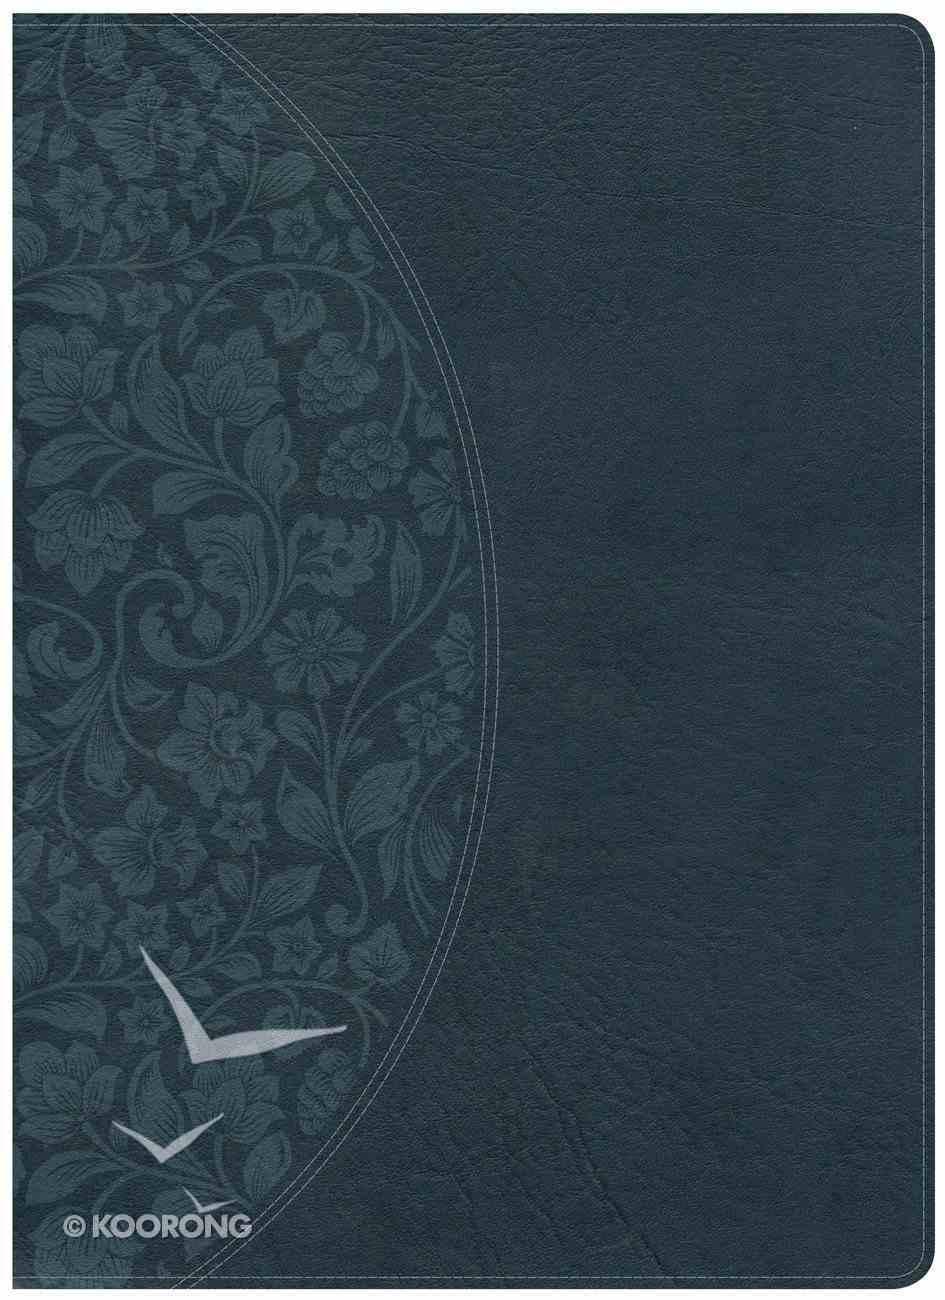 NKJV Large Print Holman Study Bible Dark Teal Indexed Imitation Leather